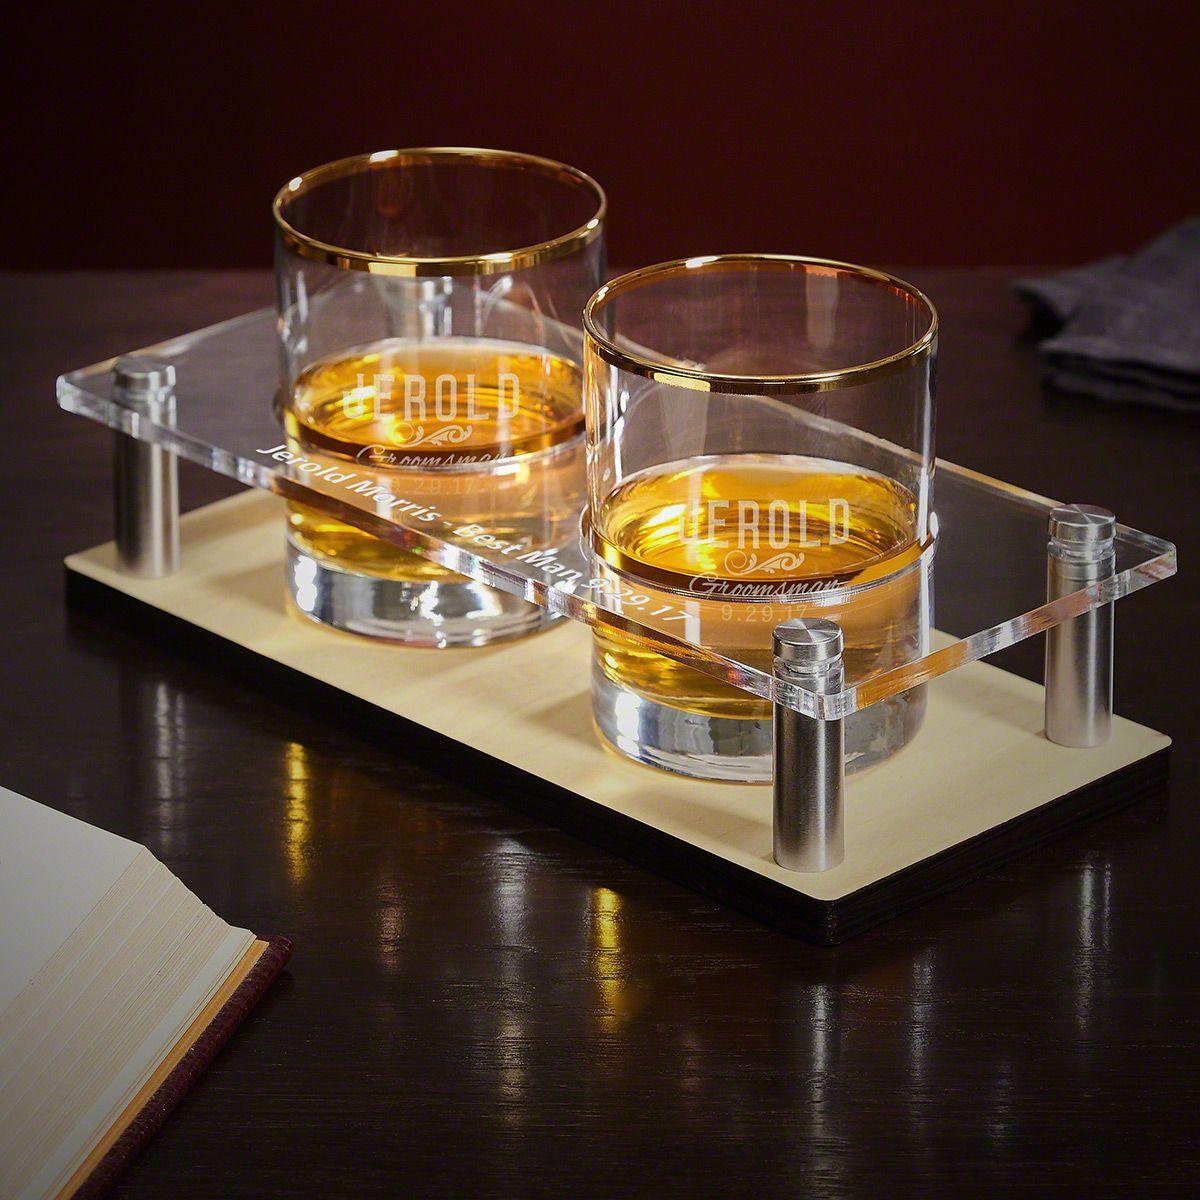 Classic Groomsman Whiskey Tray with Custom Gold Rim Glasses 3 pc Set